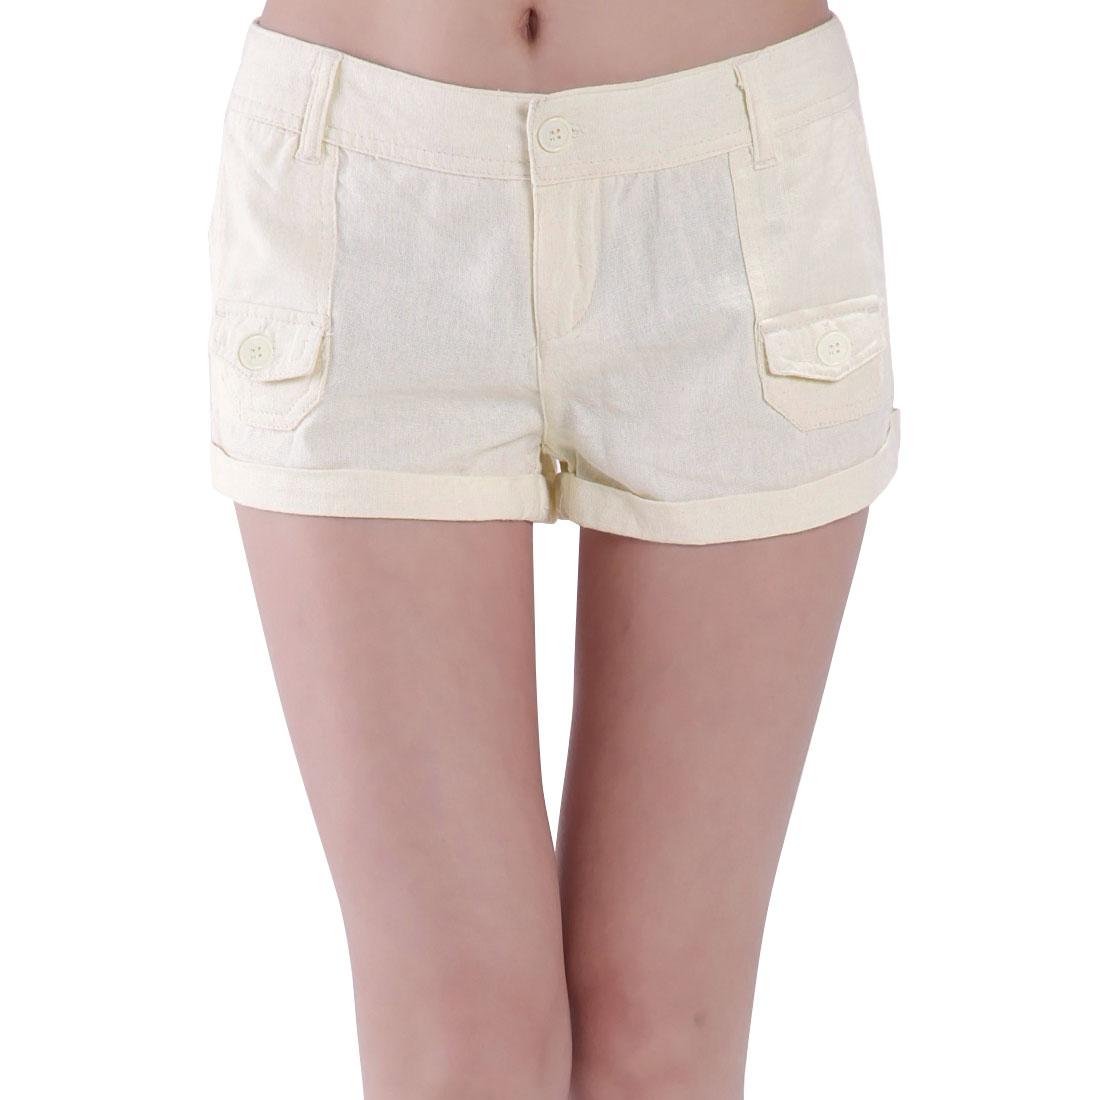 Ladies Summer Low Waist Hip Patch Pockets Zip Short Trousers Beige XS